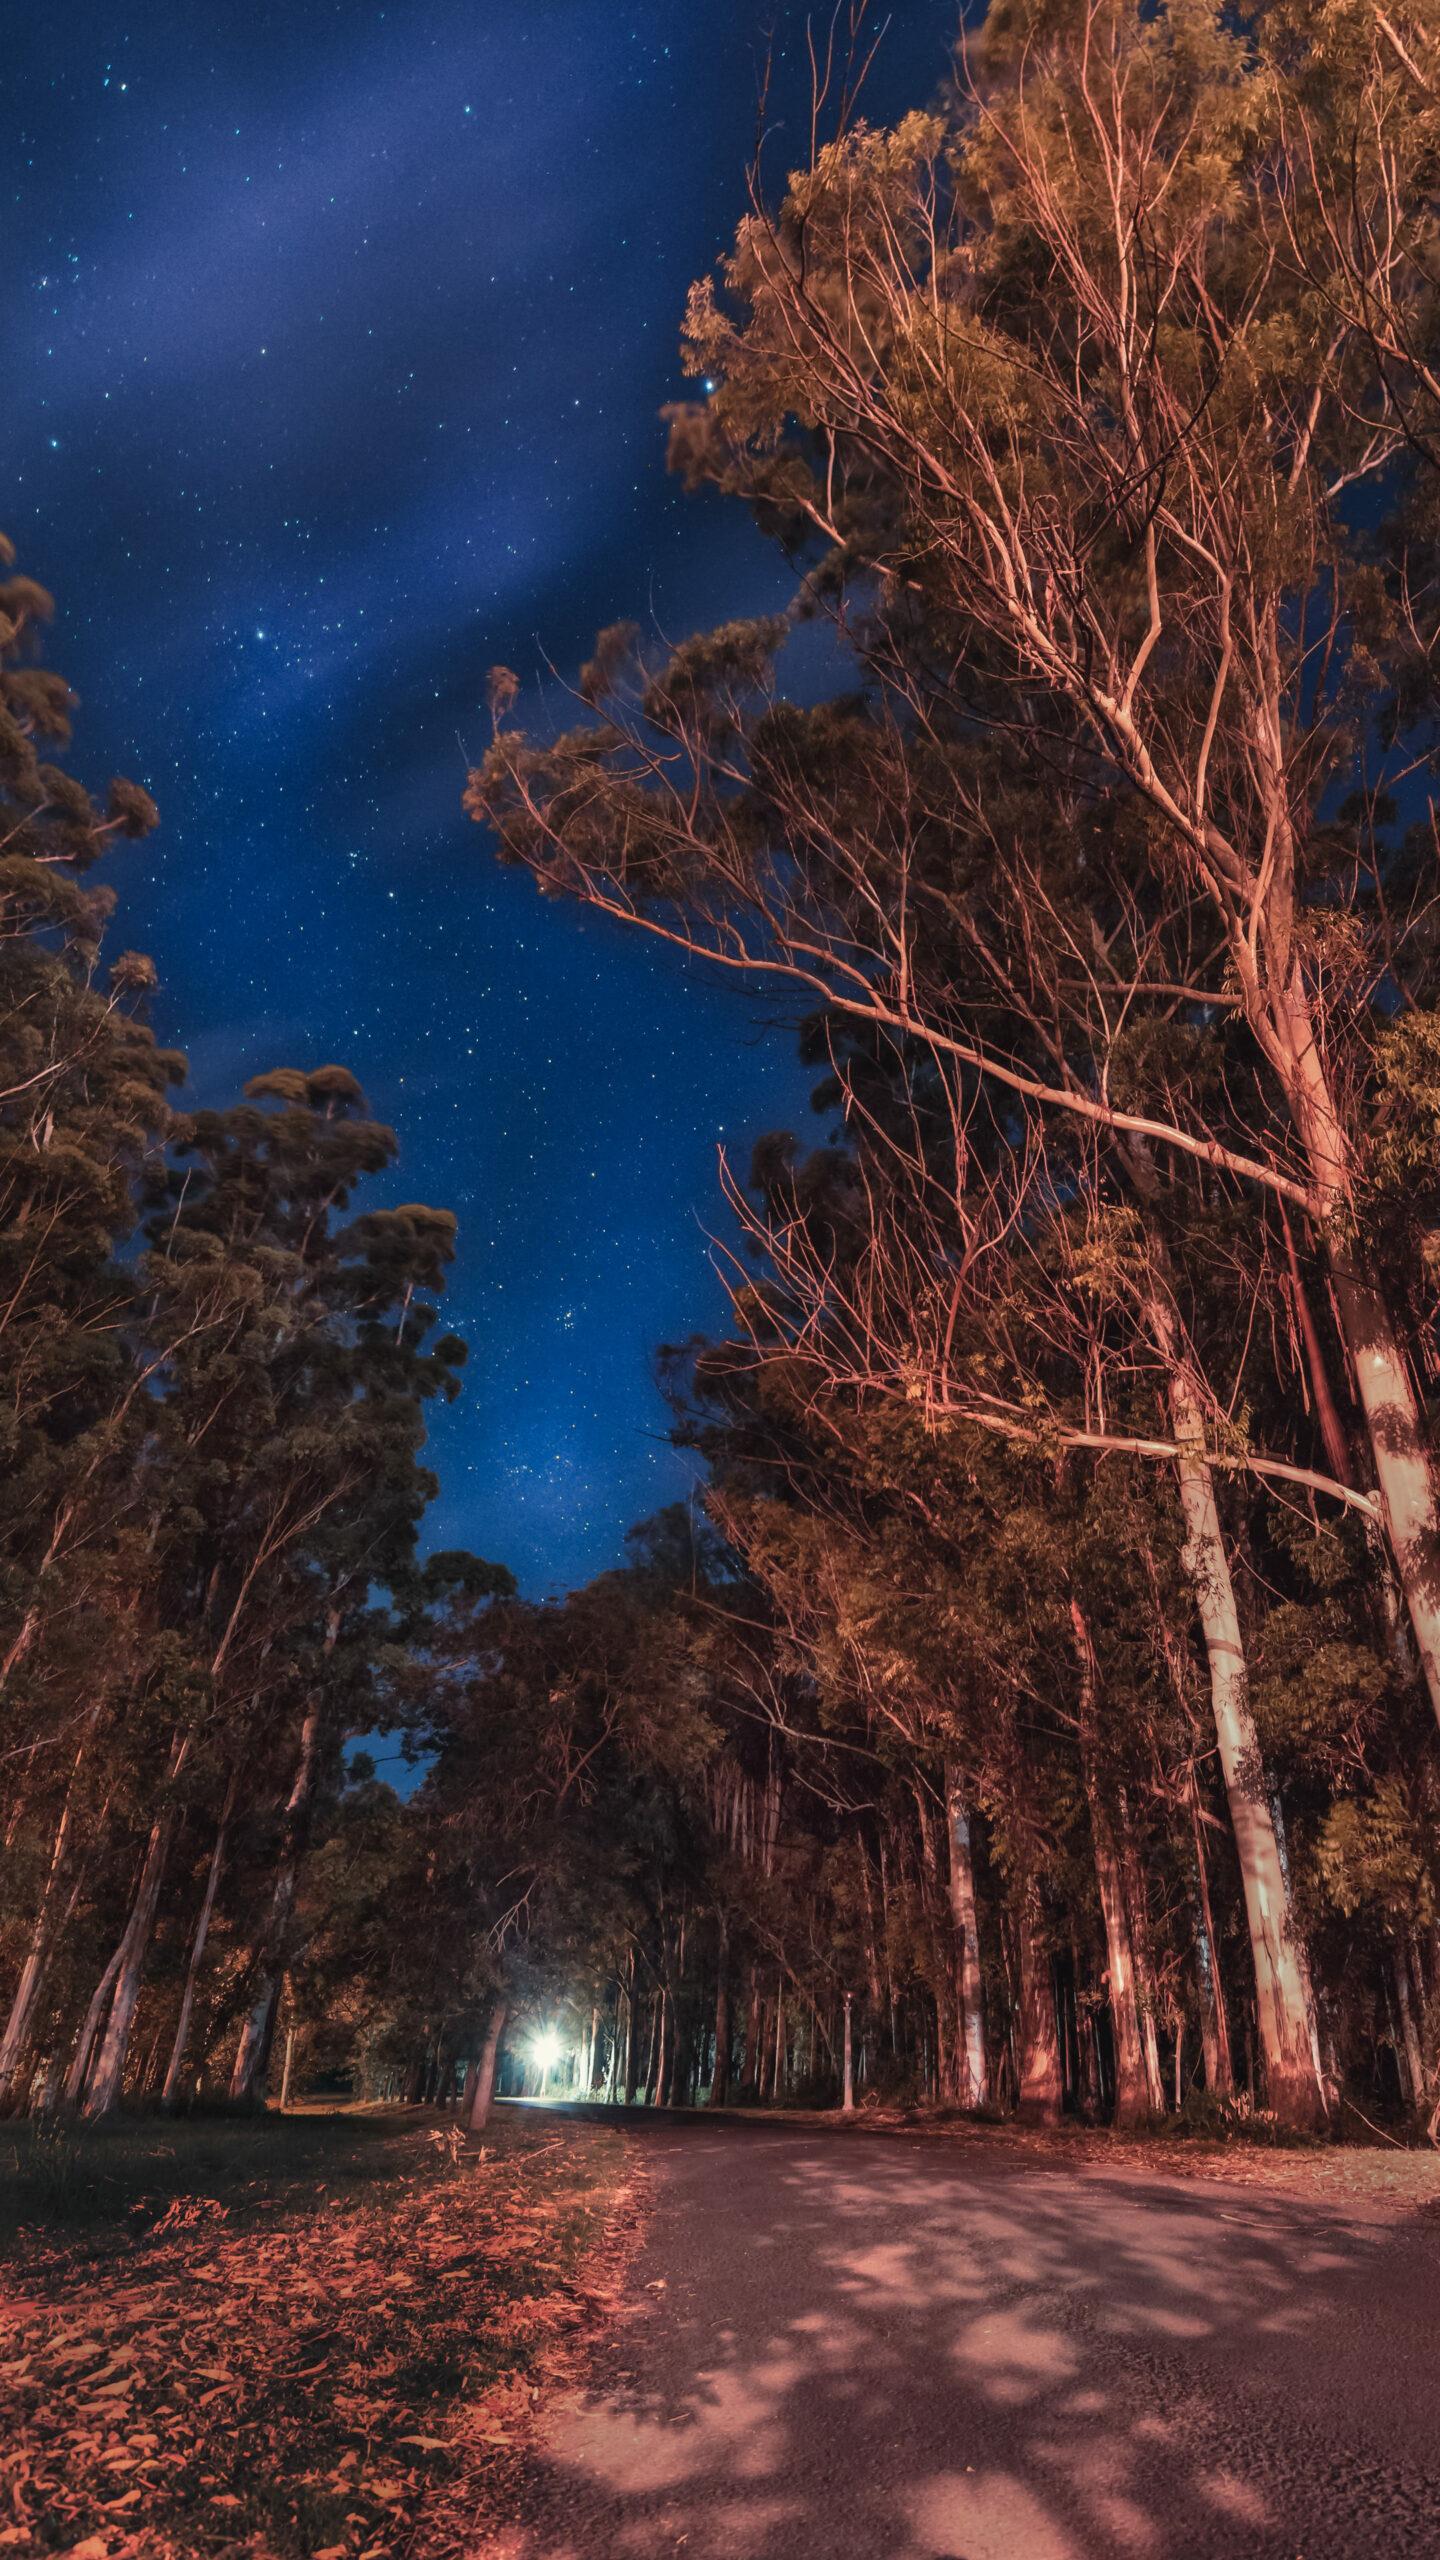 Fondo de pantalla Noches de Alberdi de Sol por Emilio Küffer